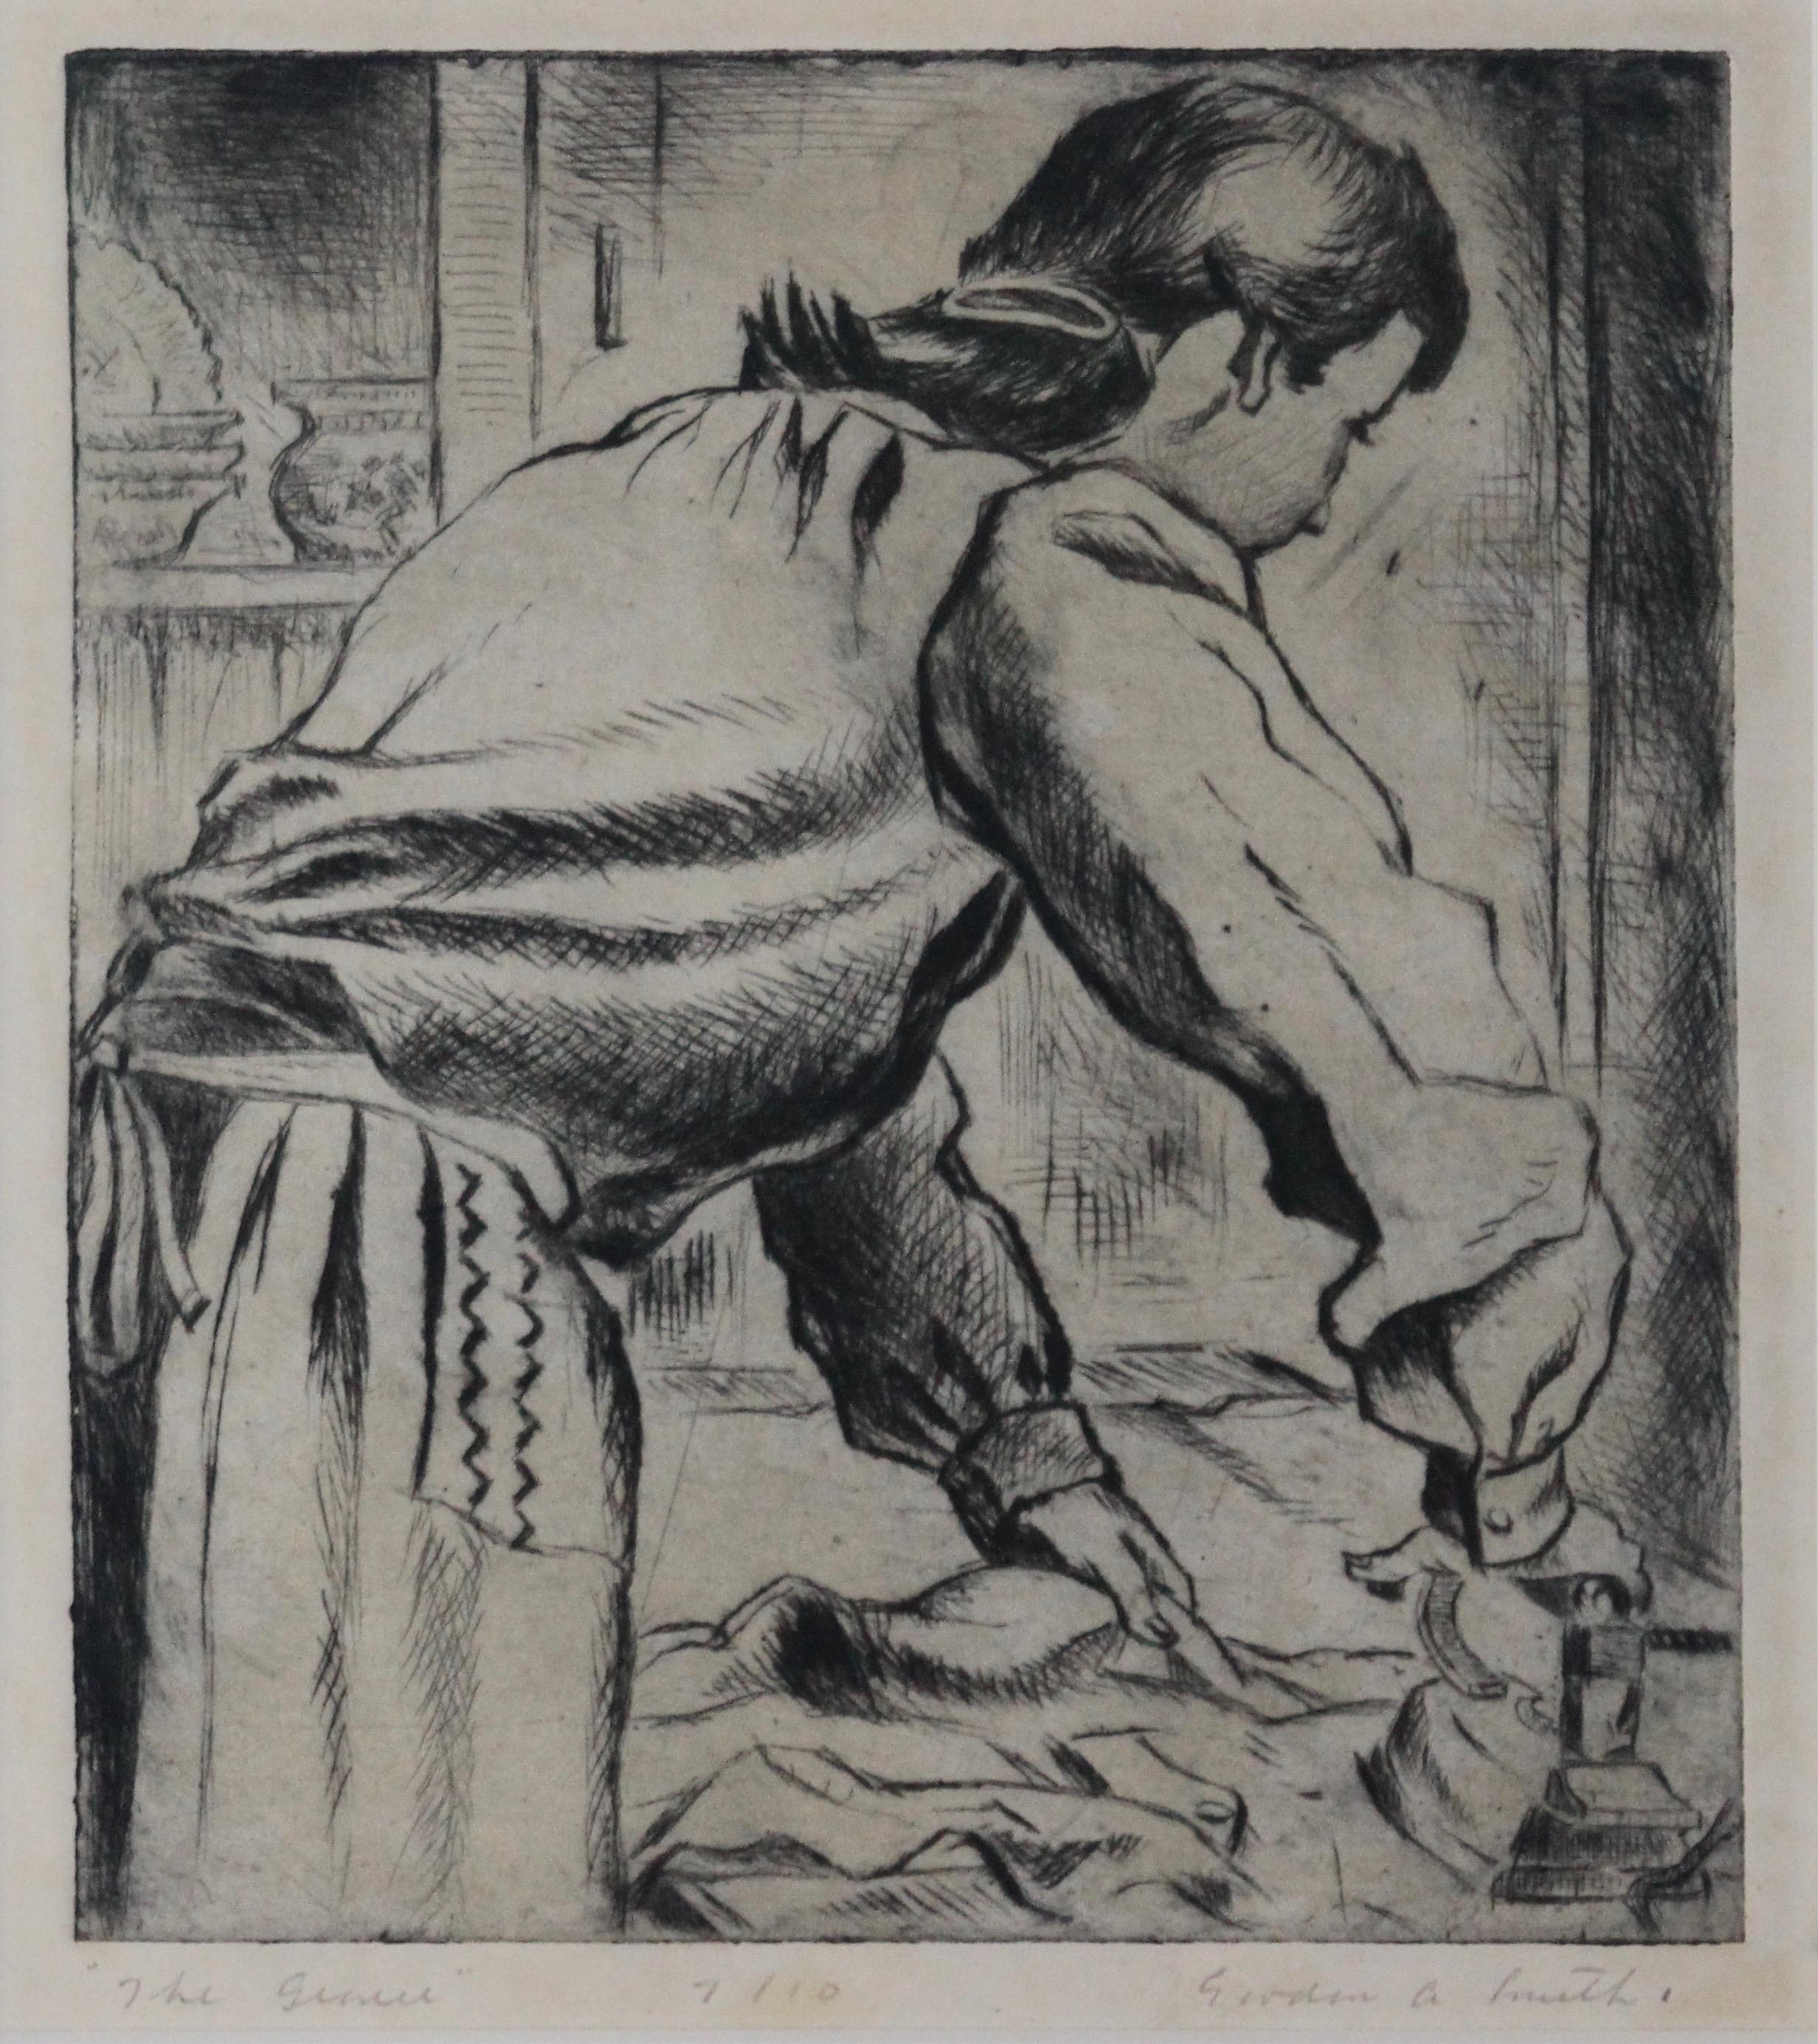 Gordon Applebe Smith, The Ironer, 1945